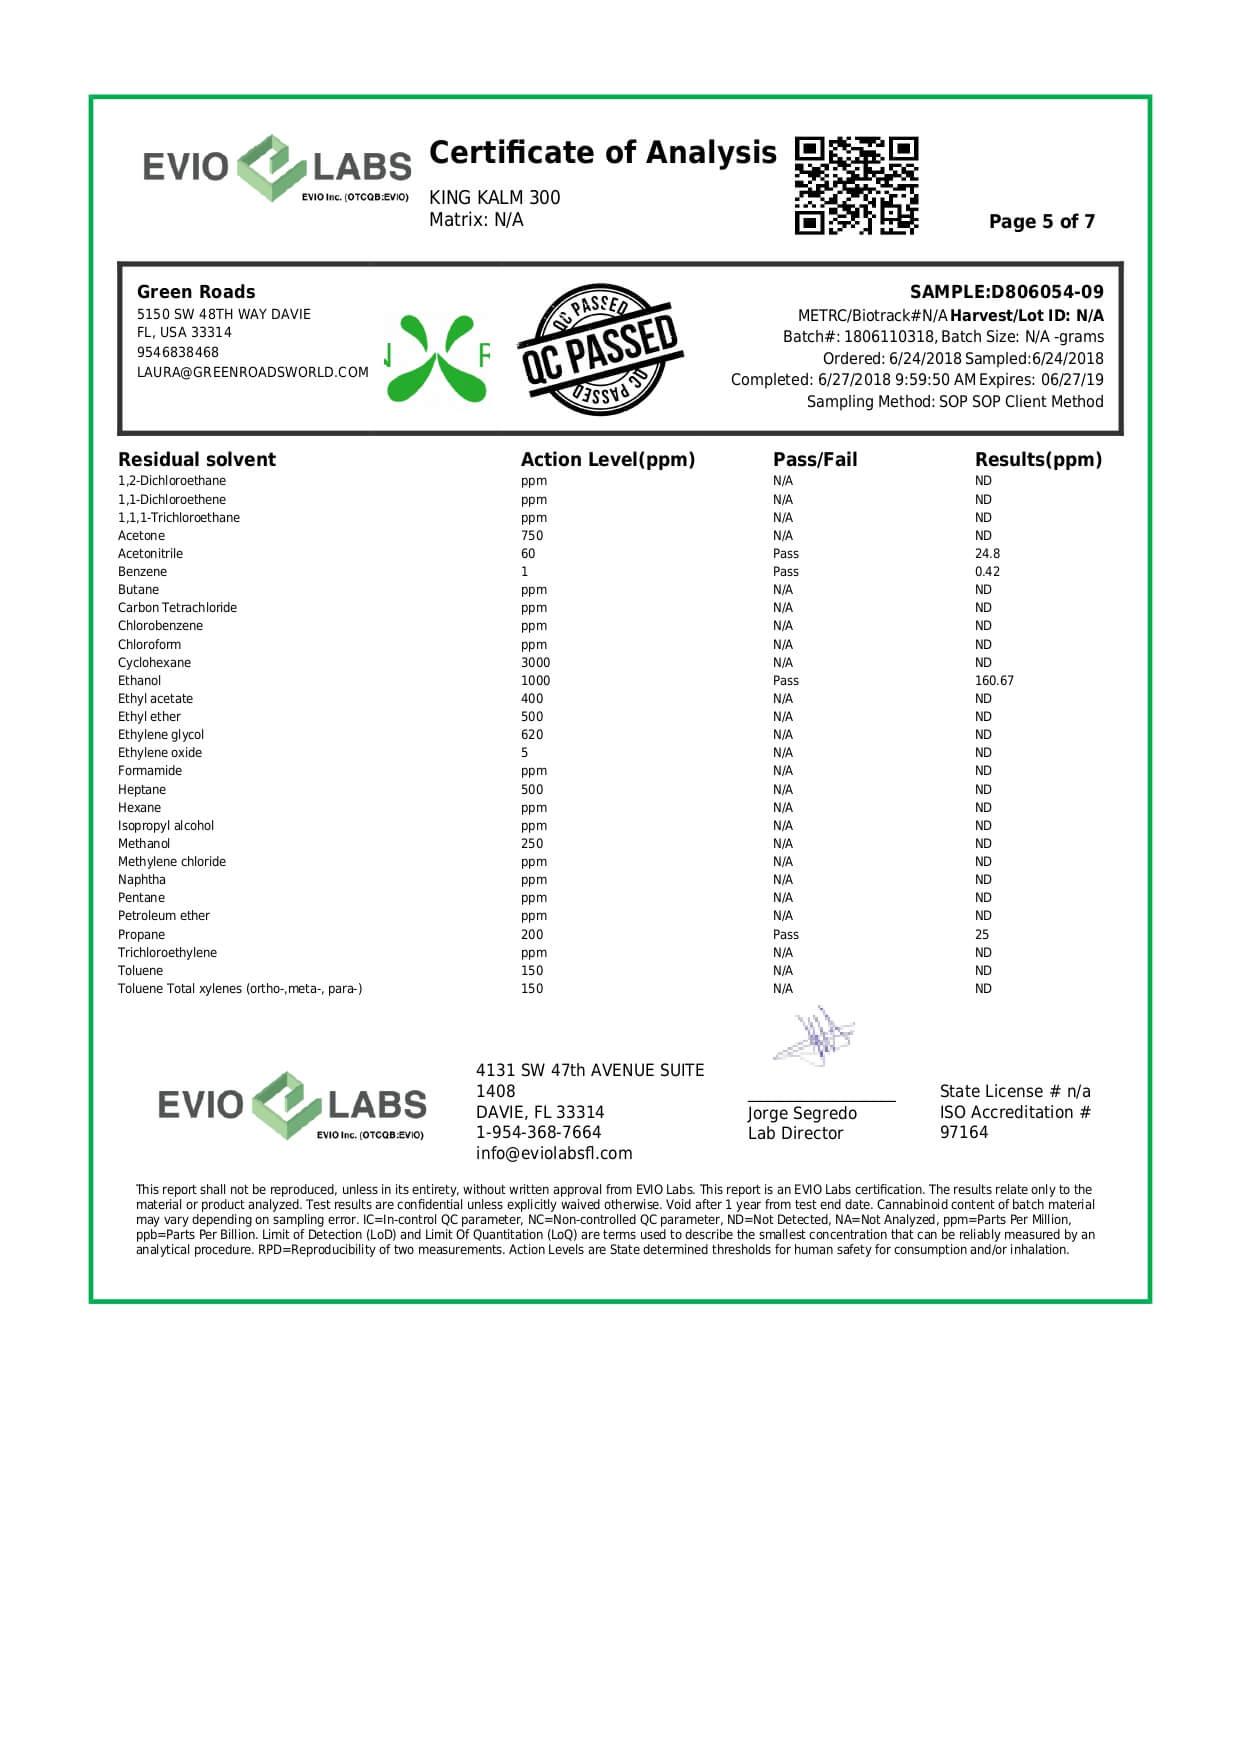 Green Roads CBD Pet Tincture KingKalmCBD Canine Formula 300mg Lab Report